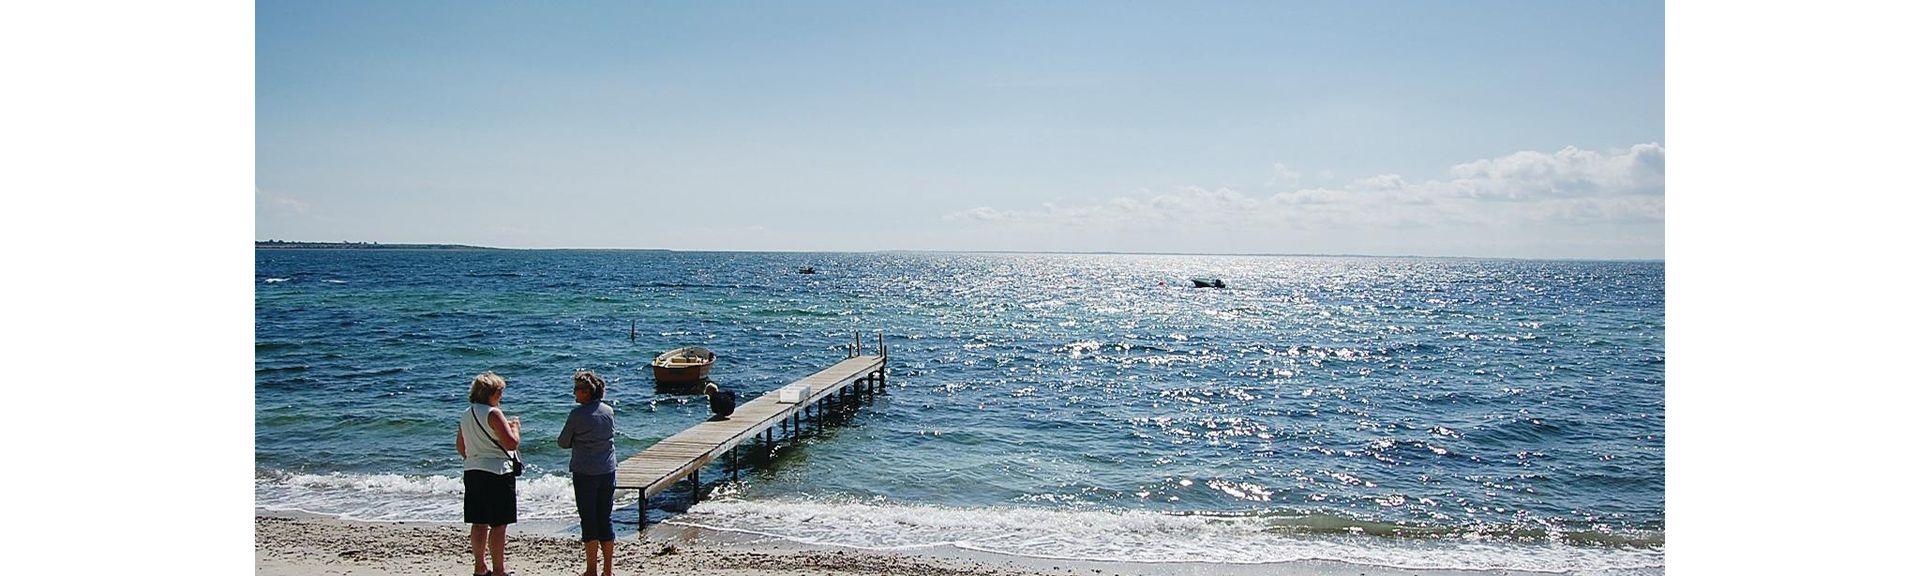 Kelstrup Strand, Haderslev, Syddanmark, Dinamarca